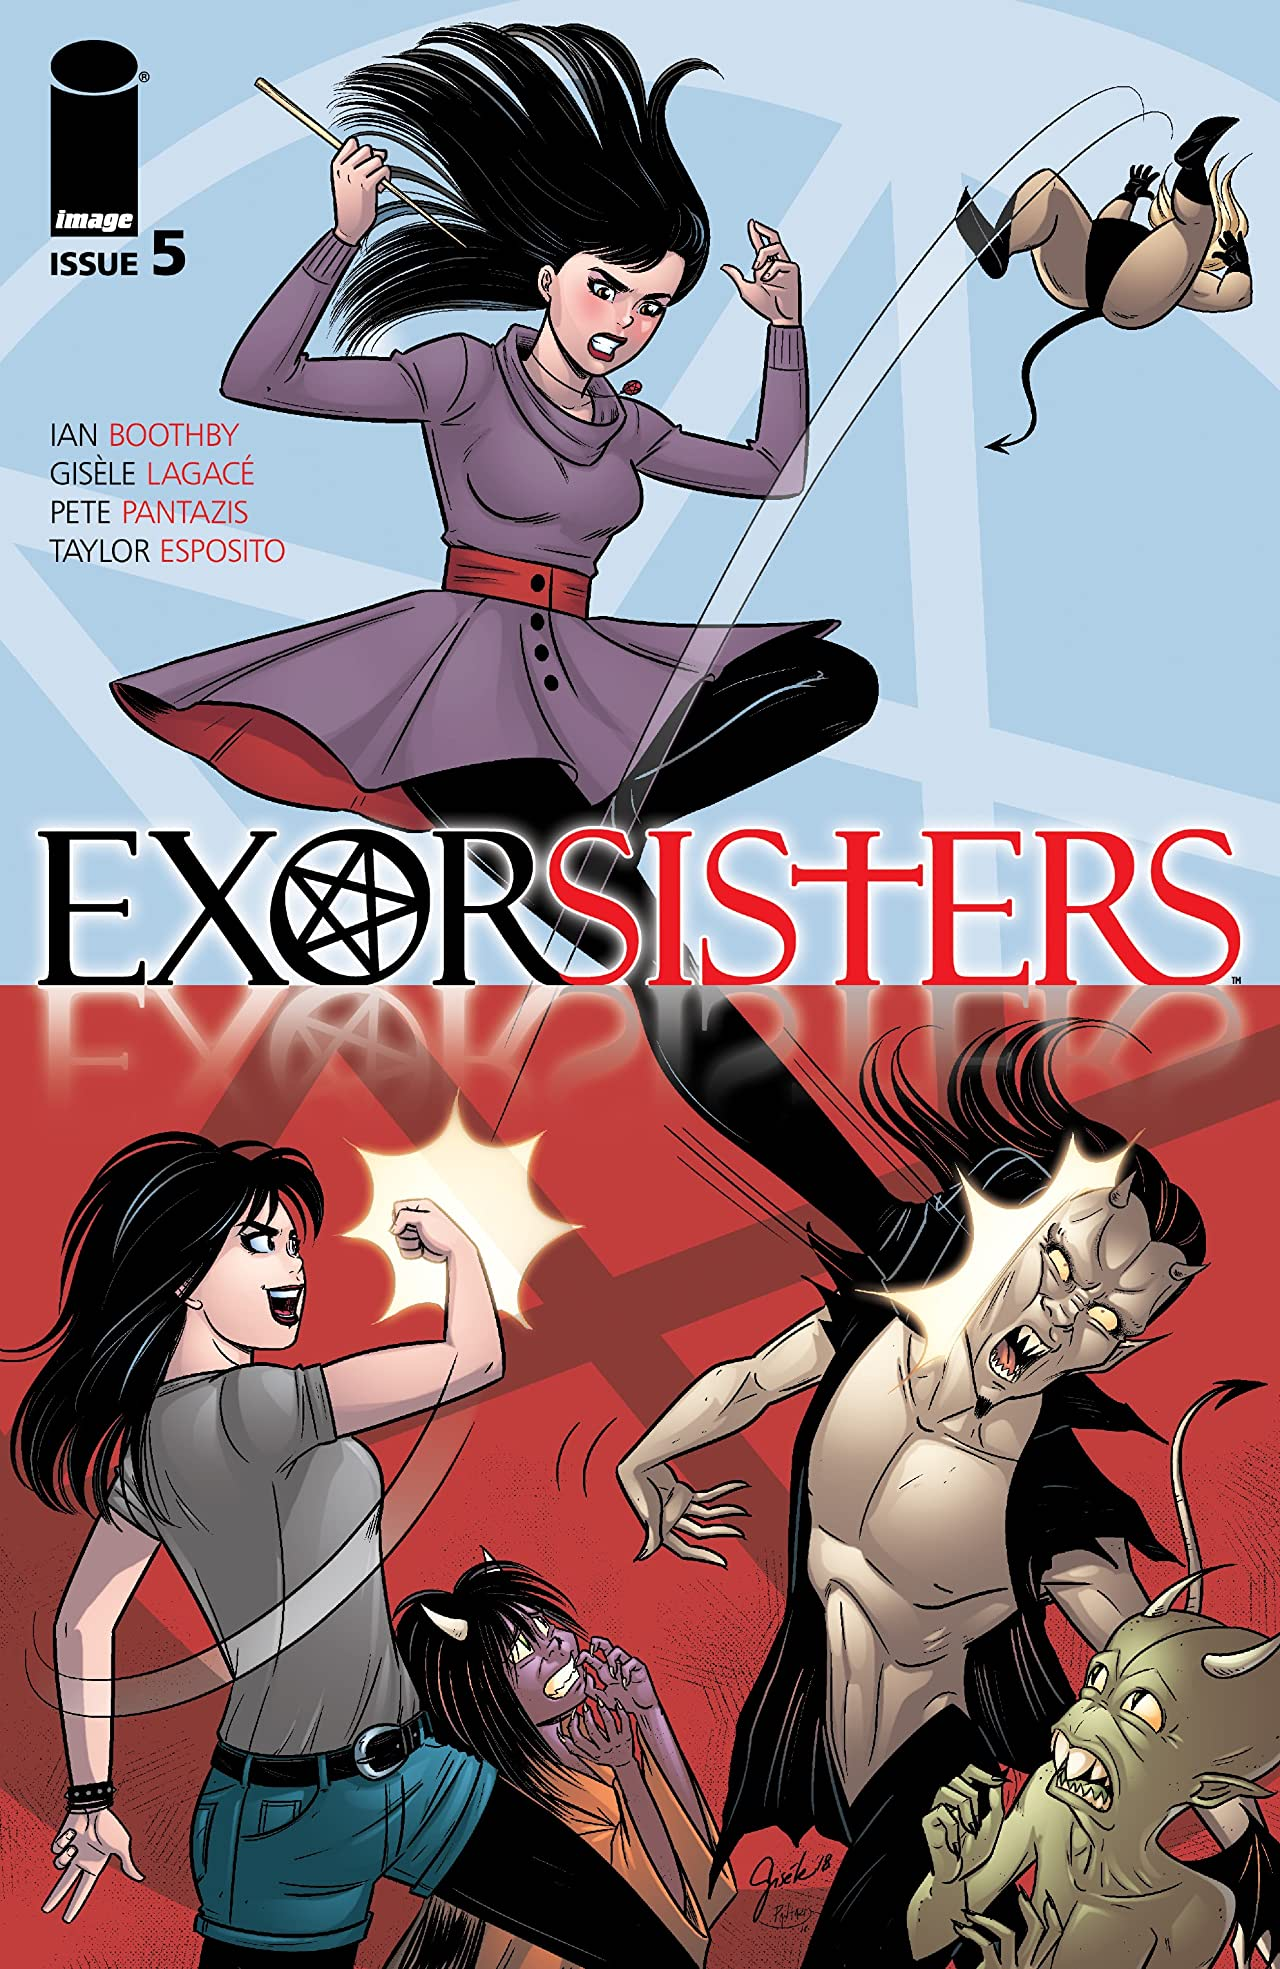 Exorsisters No.5